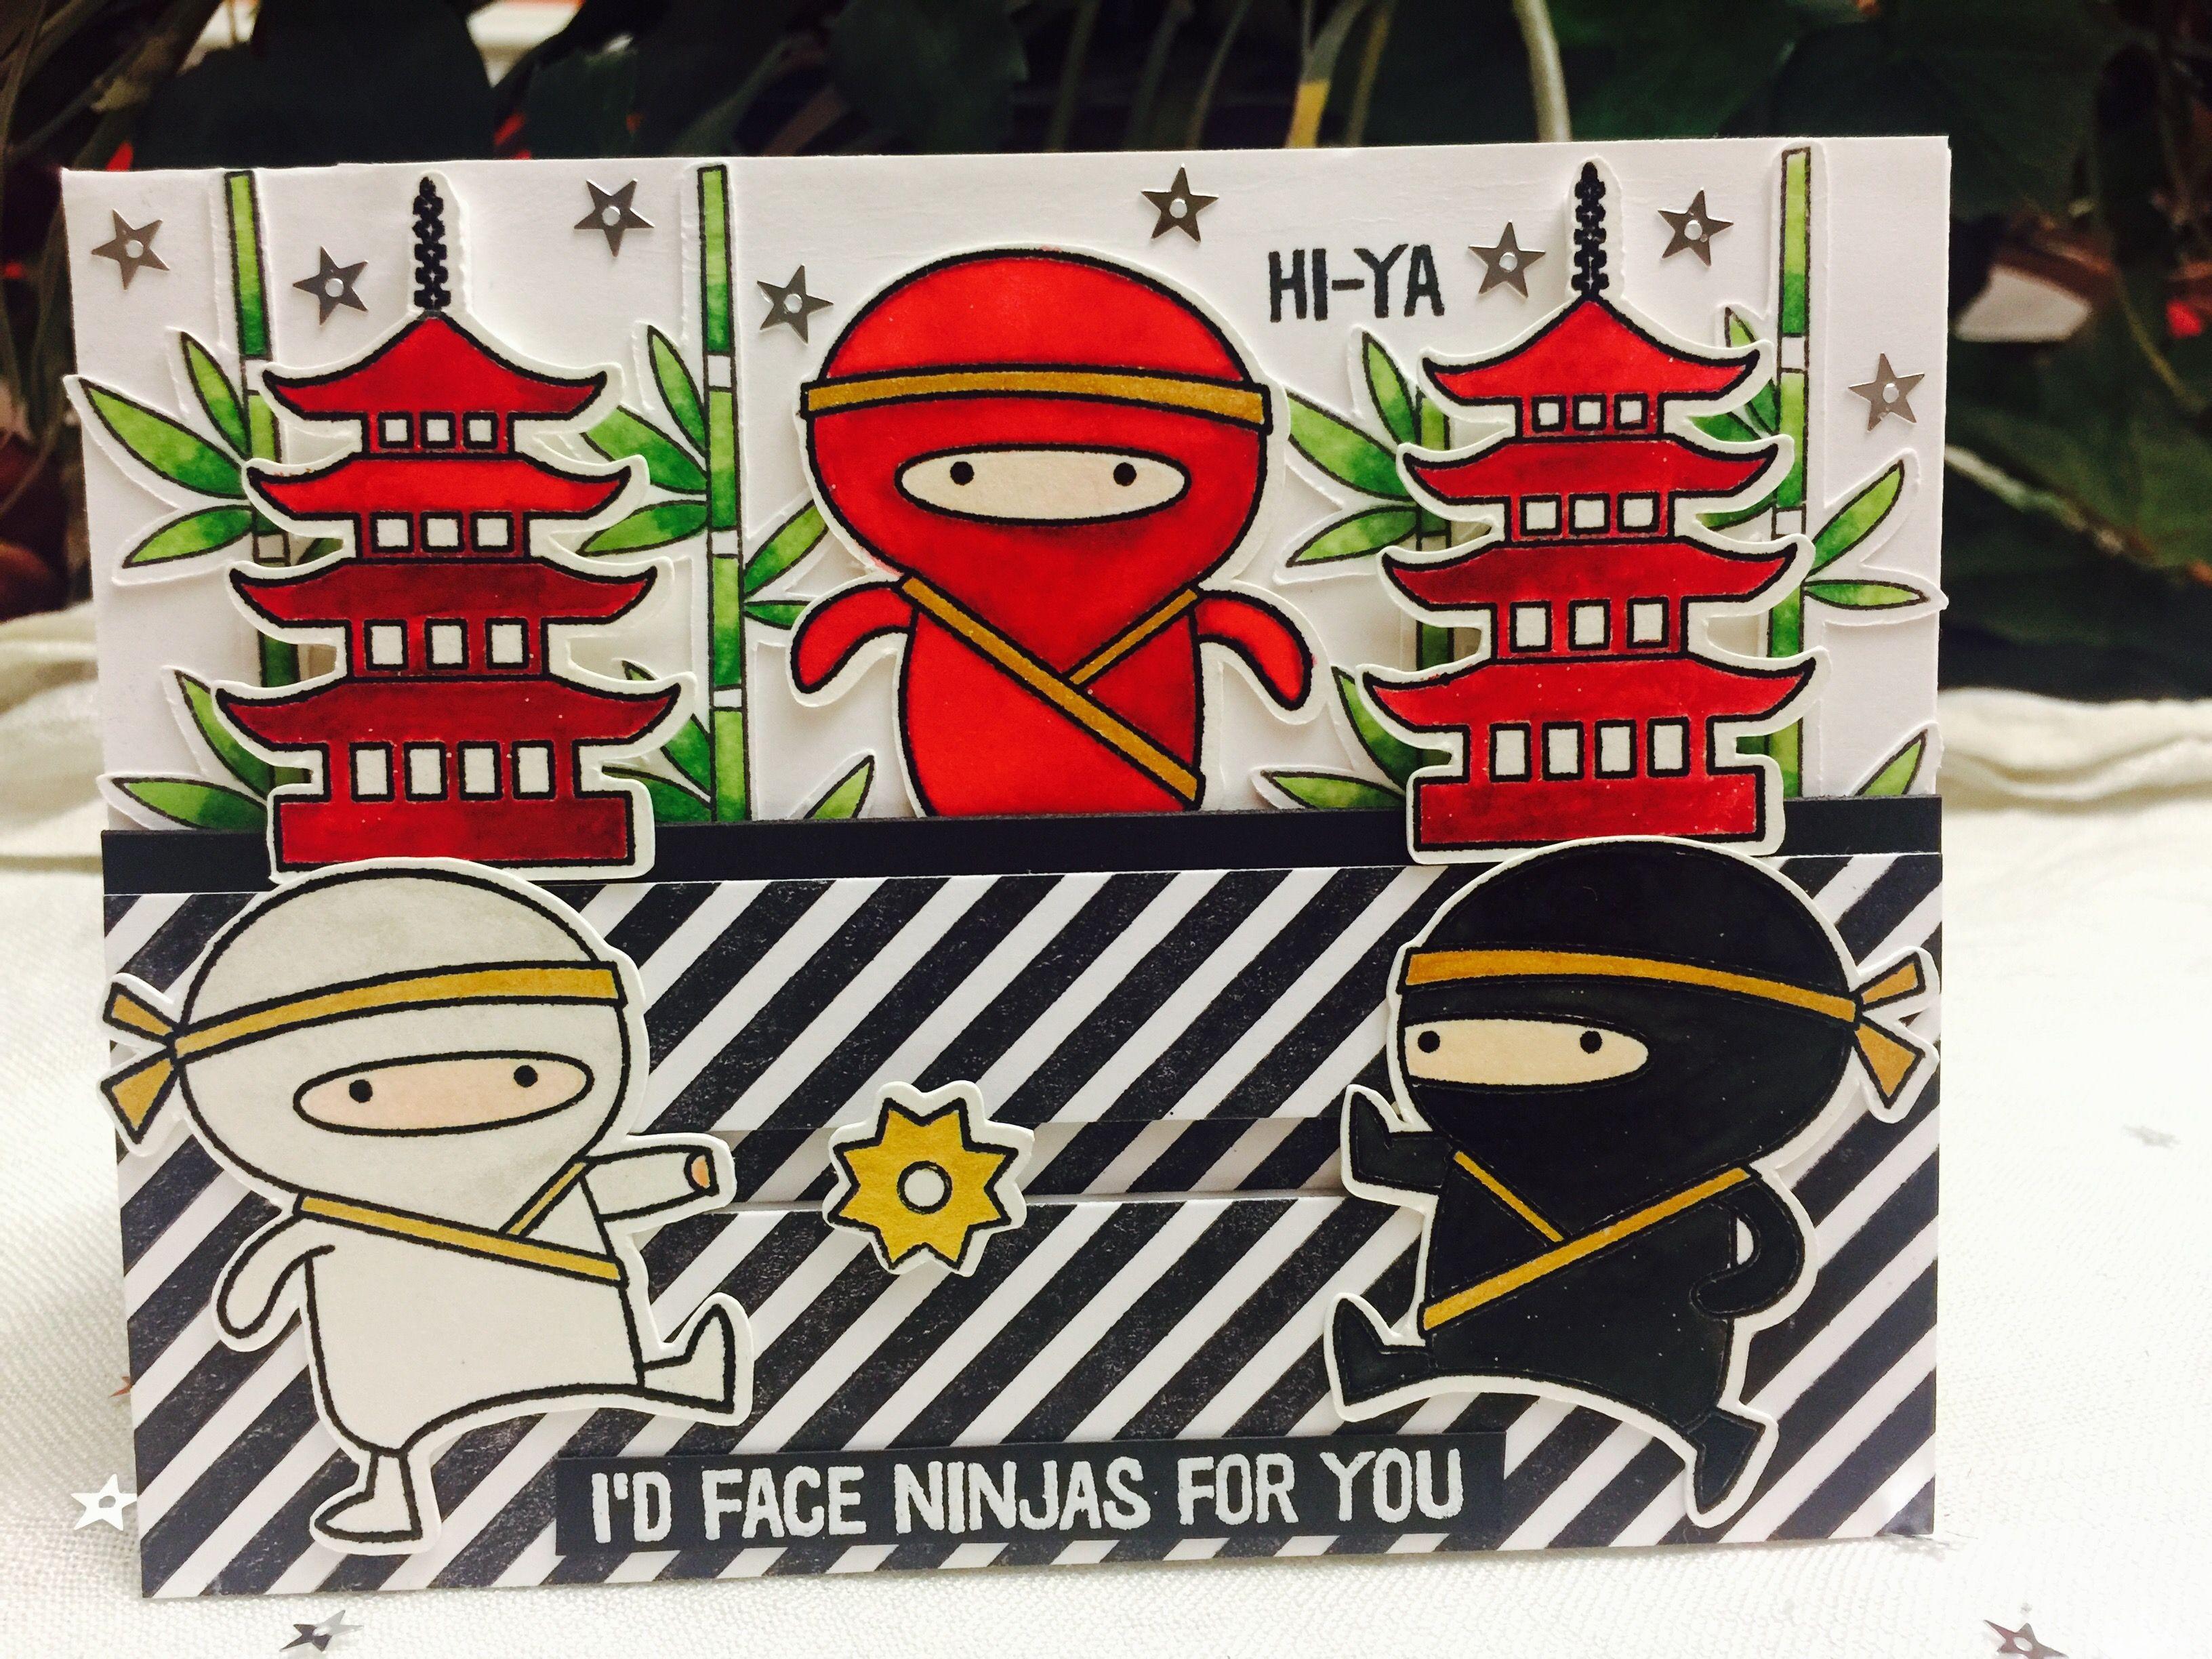 Papercraft Ninja Mft Ninja Mazing Paper Crafting Cards asia